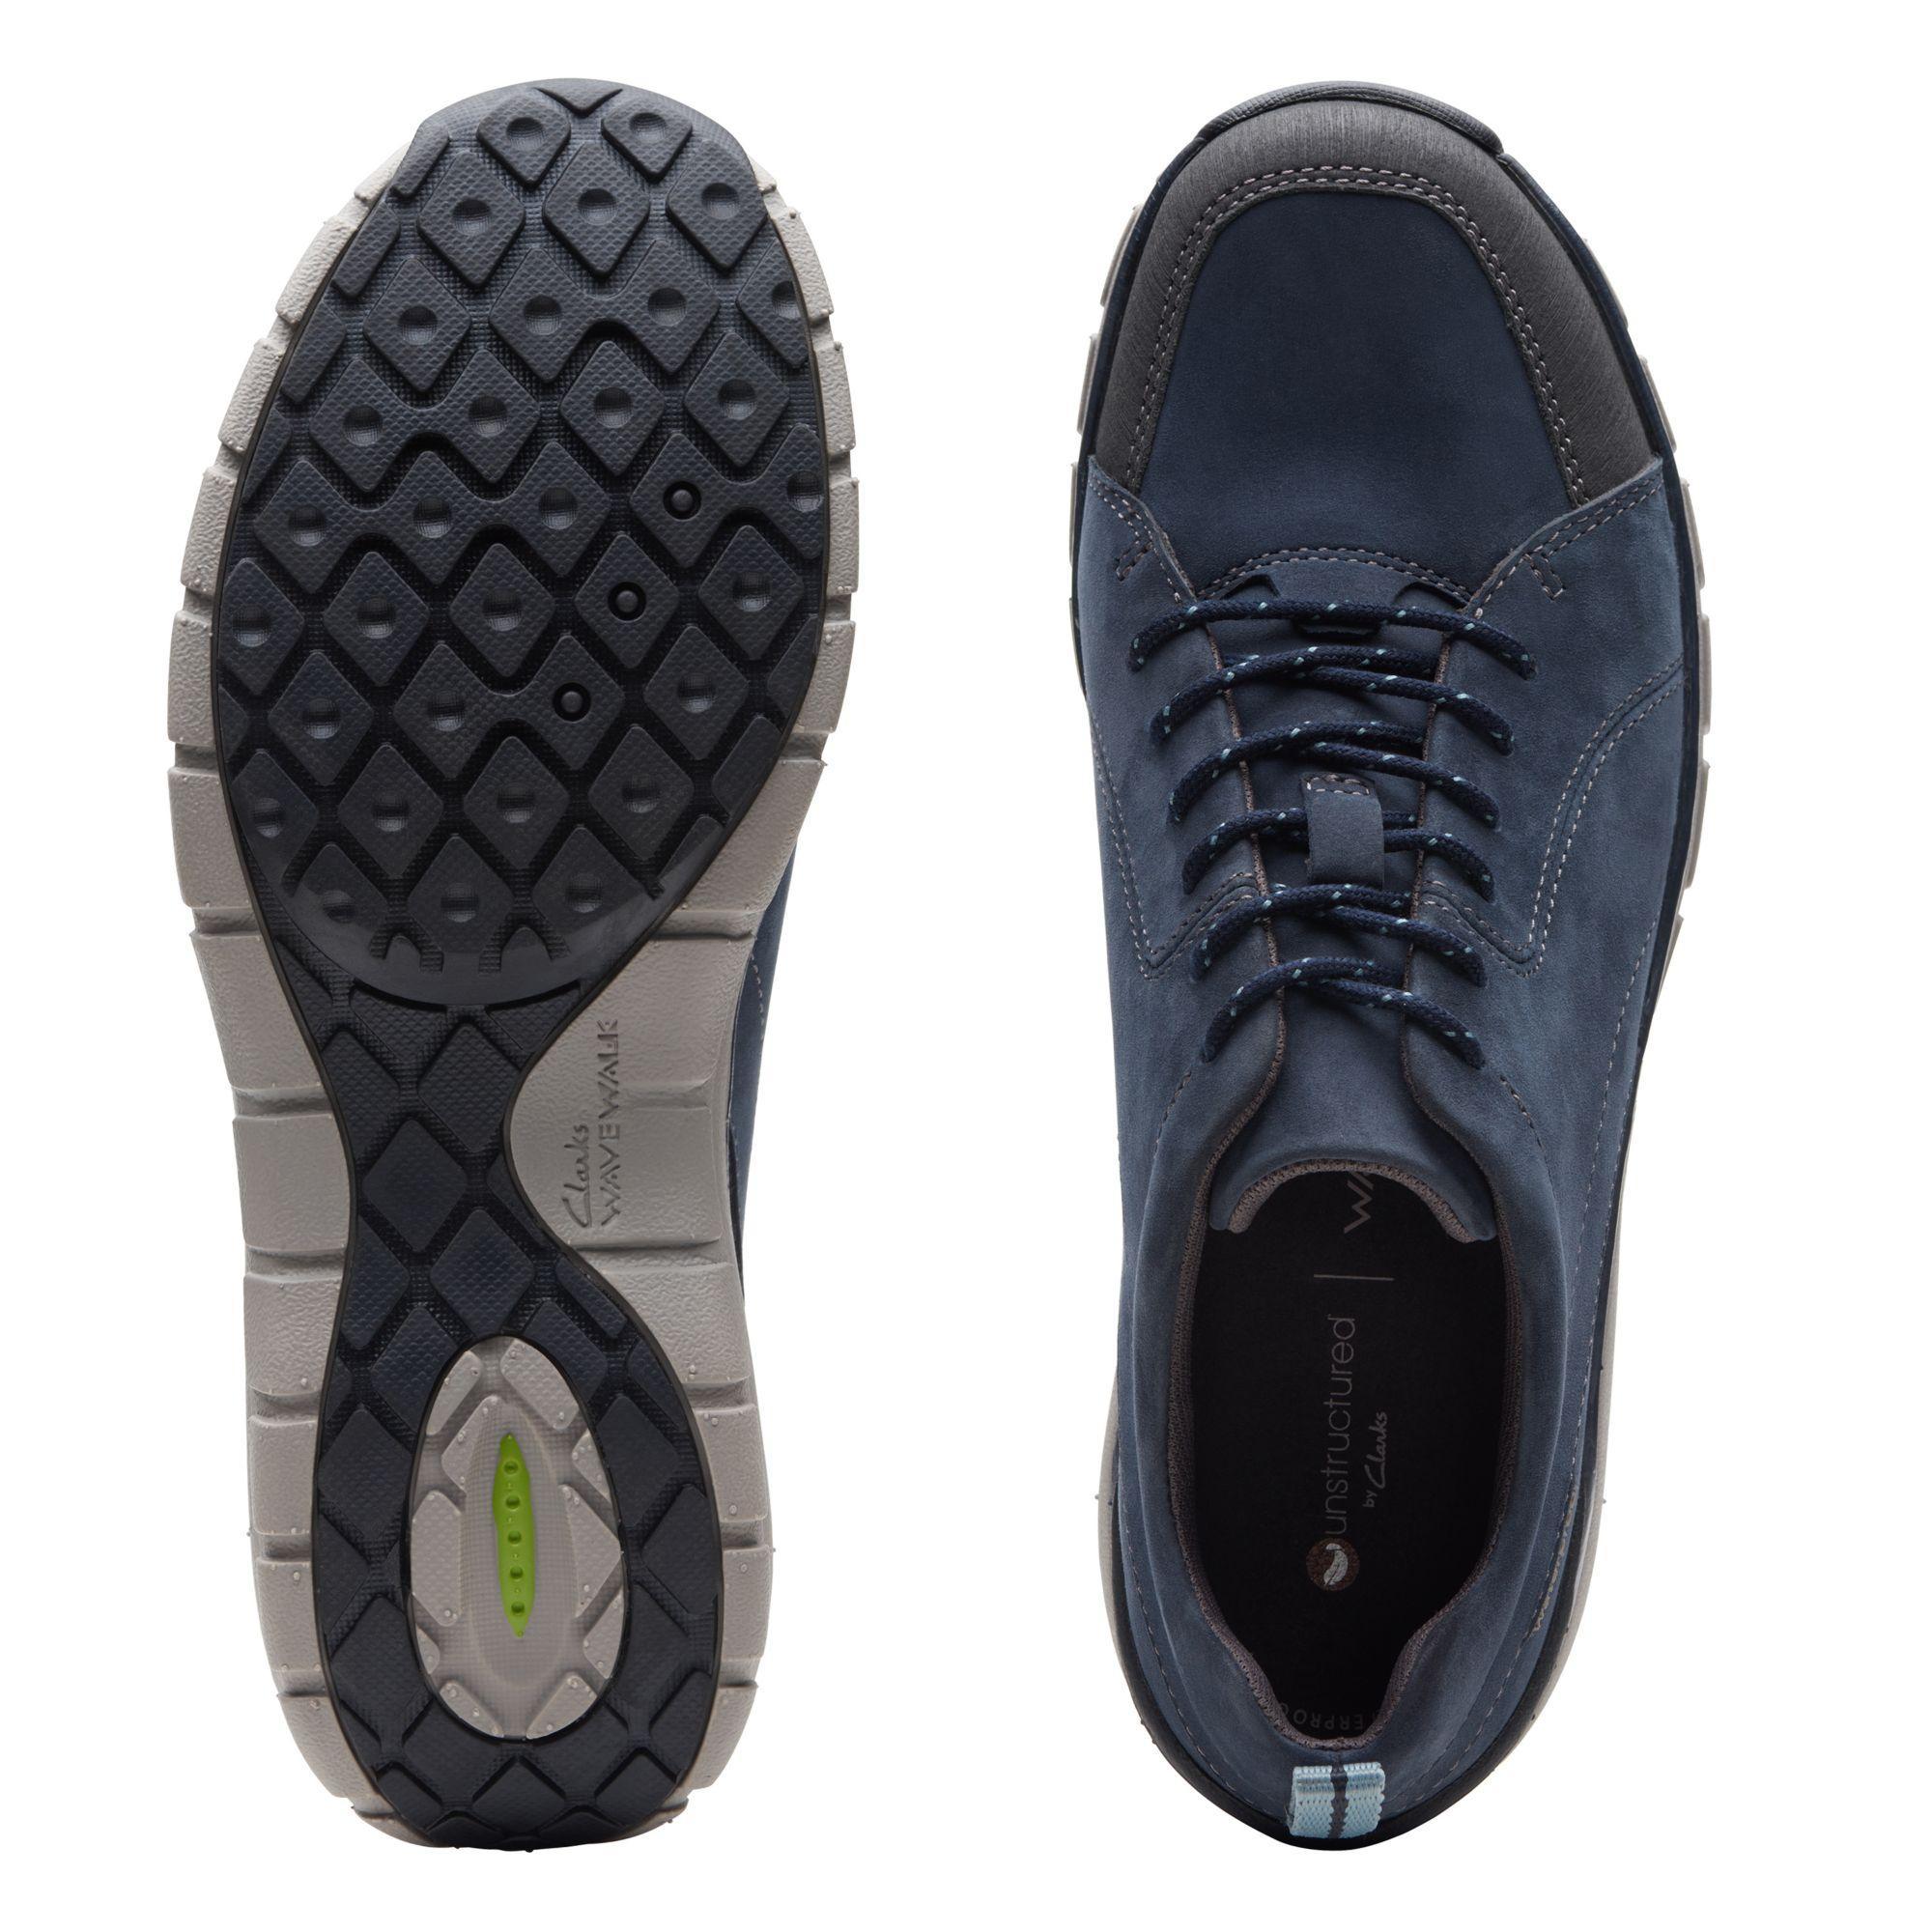 Clarks Wave Go Waterproof Sneaker